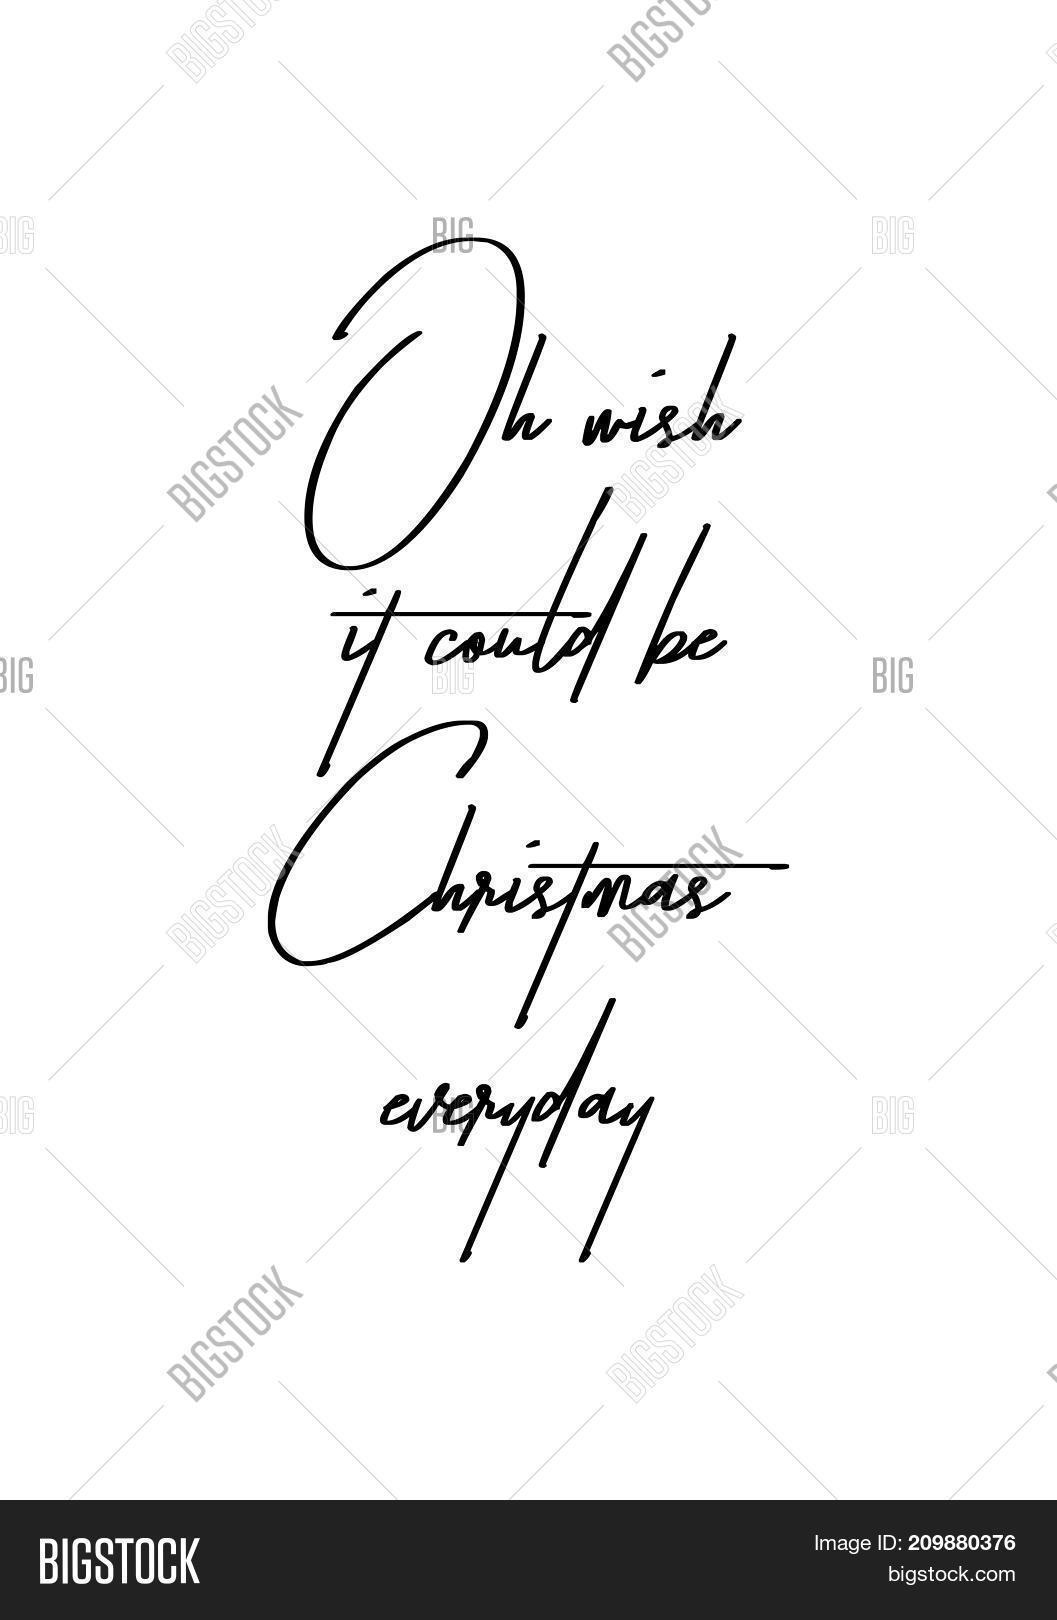 Christmas Greeting Vector & Photo (Free Trial) | Bigstock